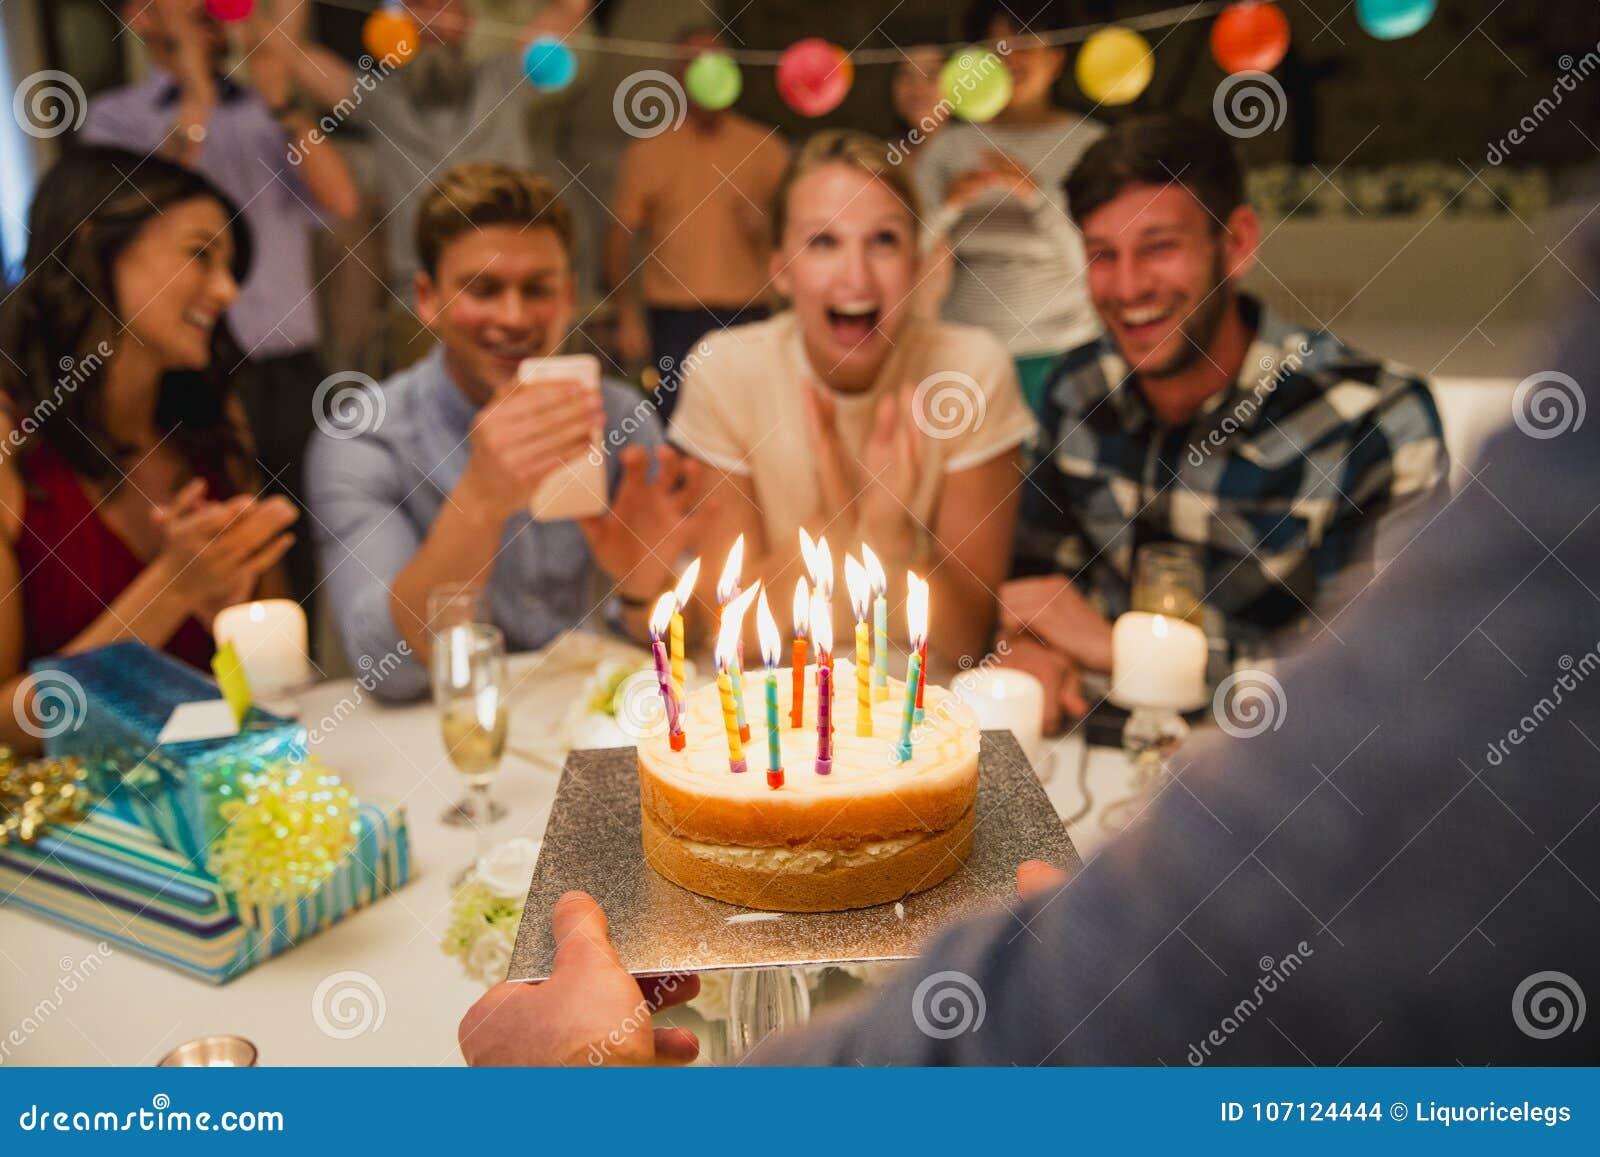 Gelukkige verjaardag aan u!